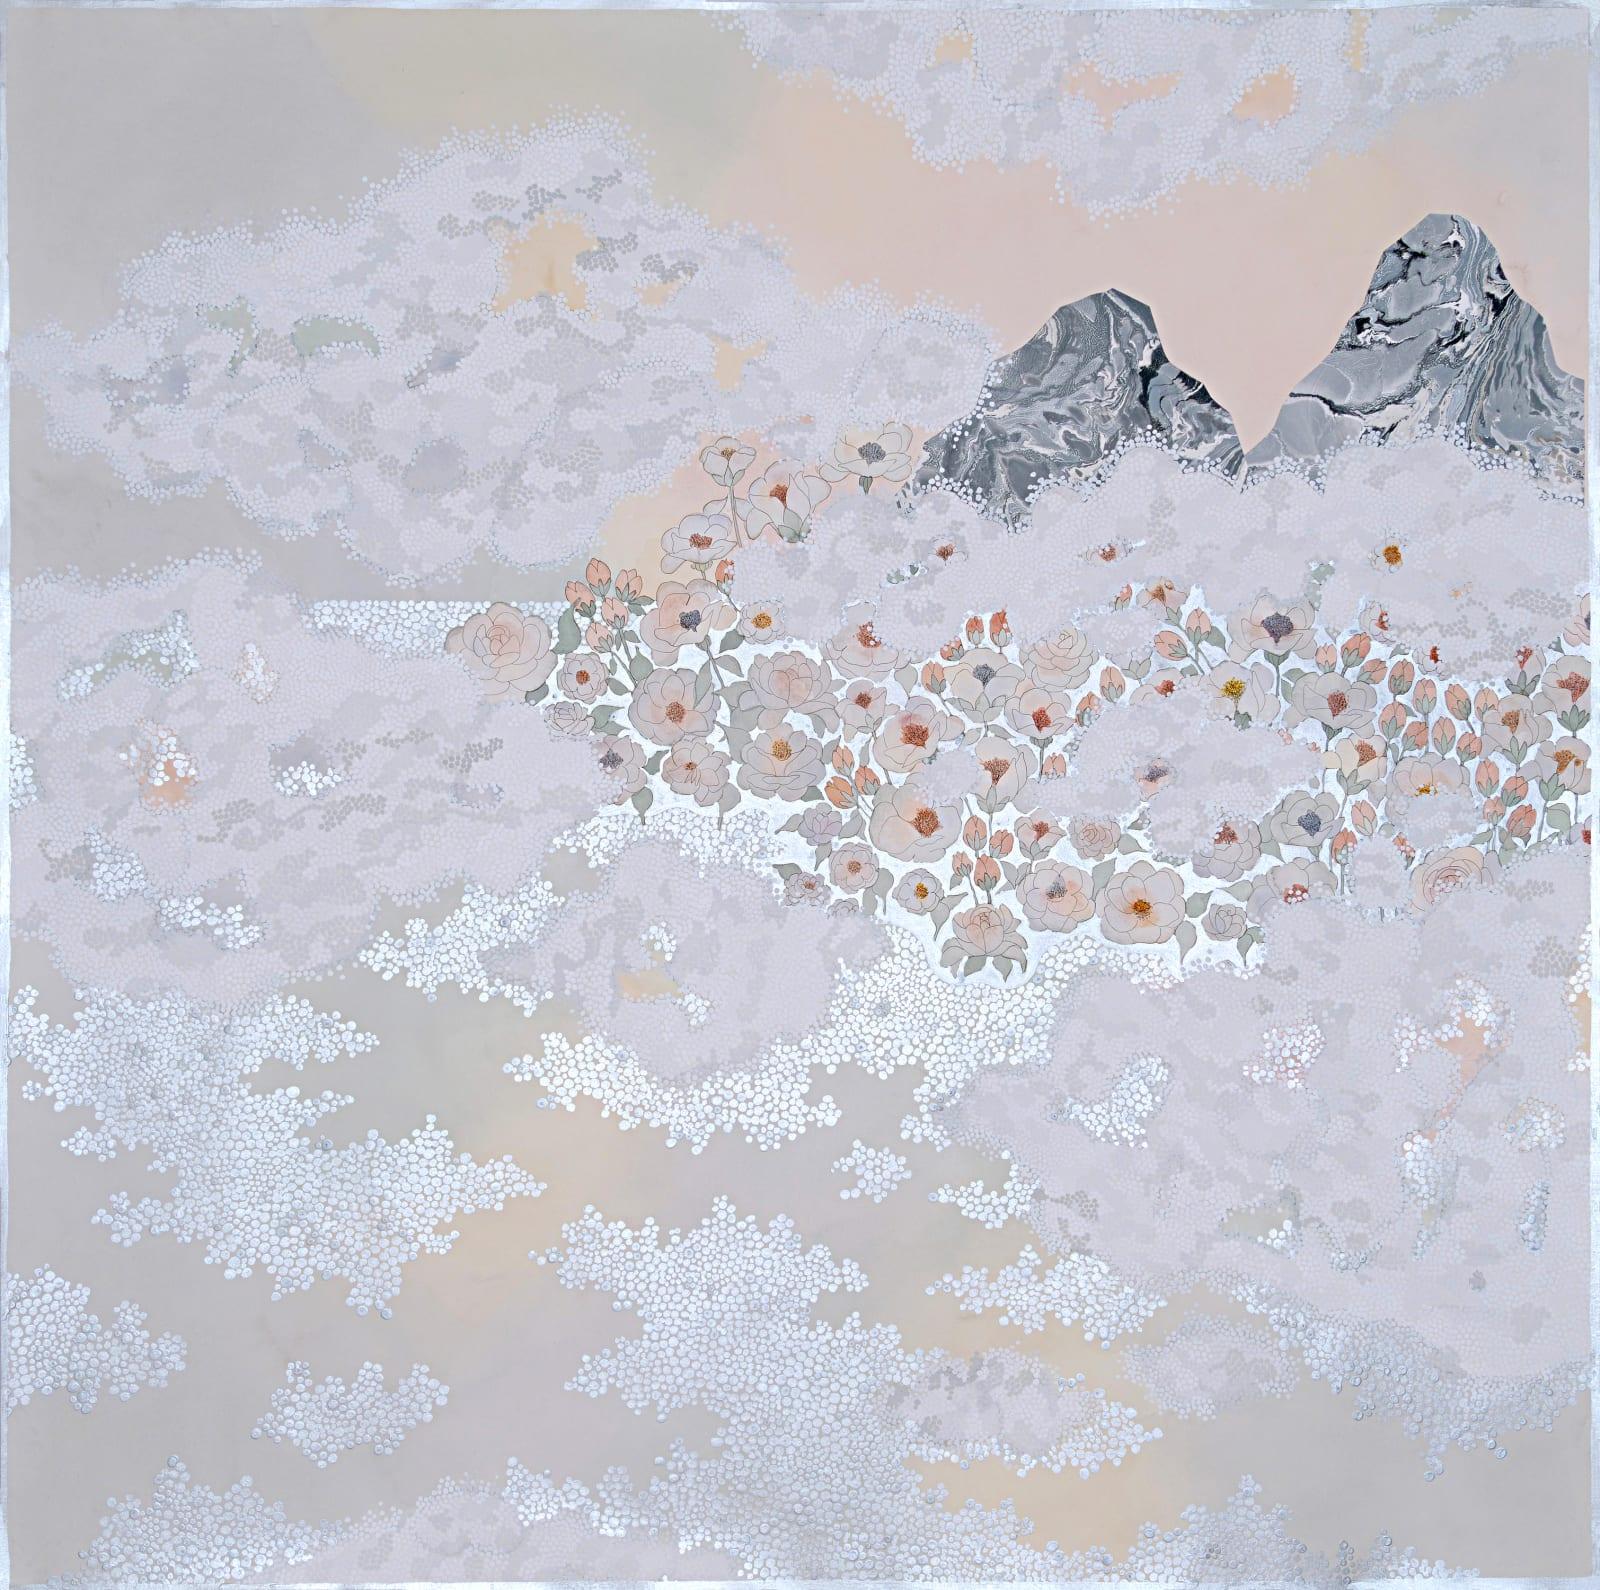 Crystal Liu, the fog, 'embrace', 2019